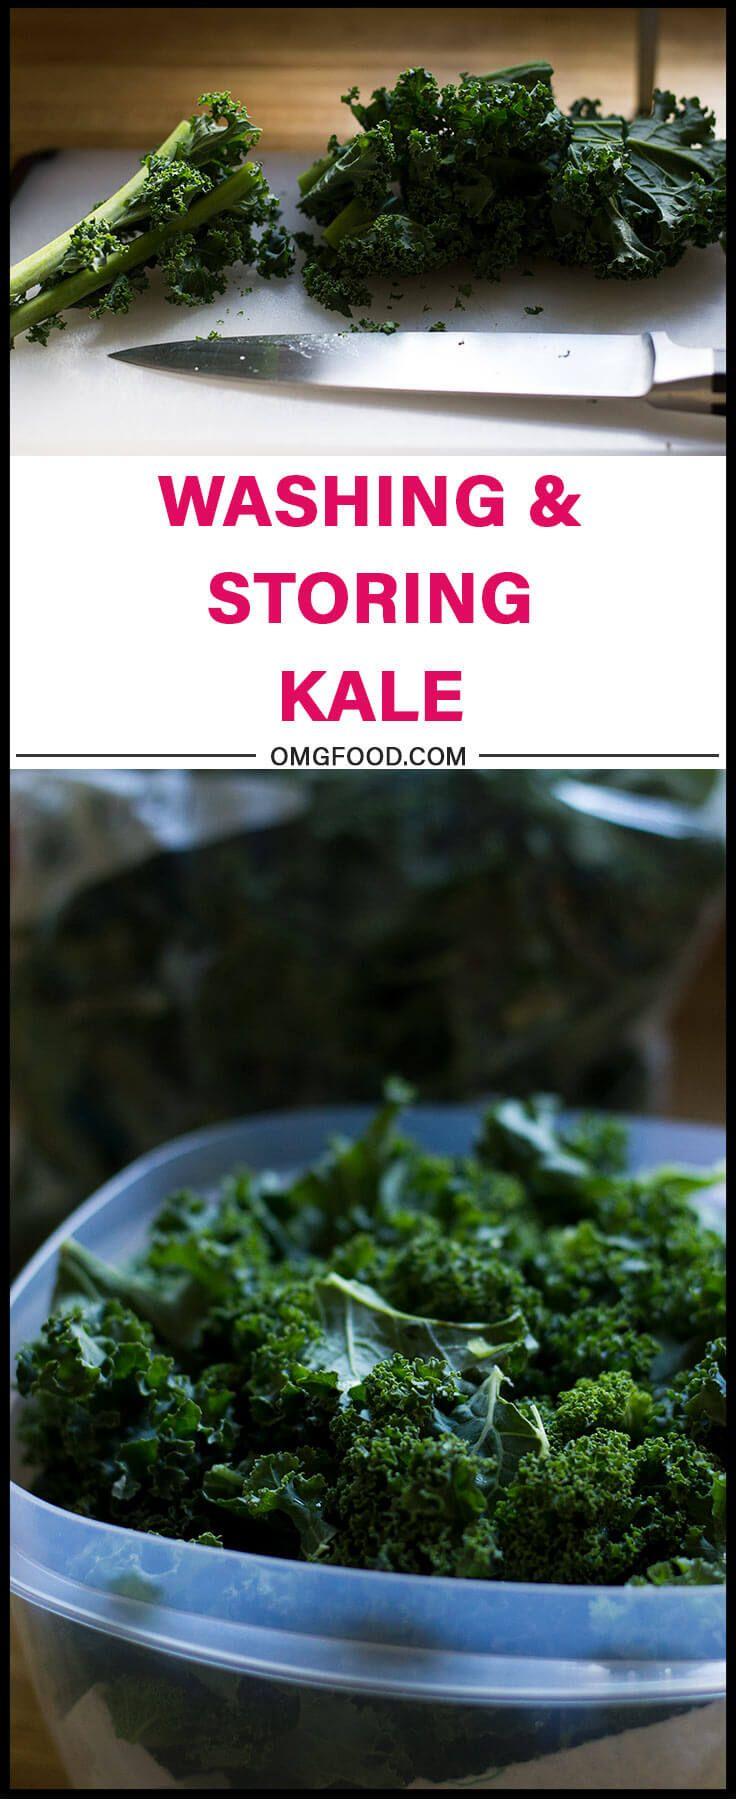 Food prep washing and storing kale food meal prep